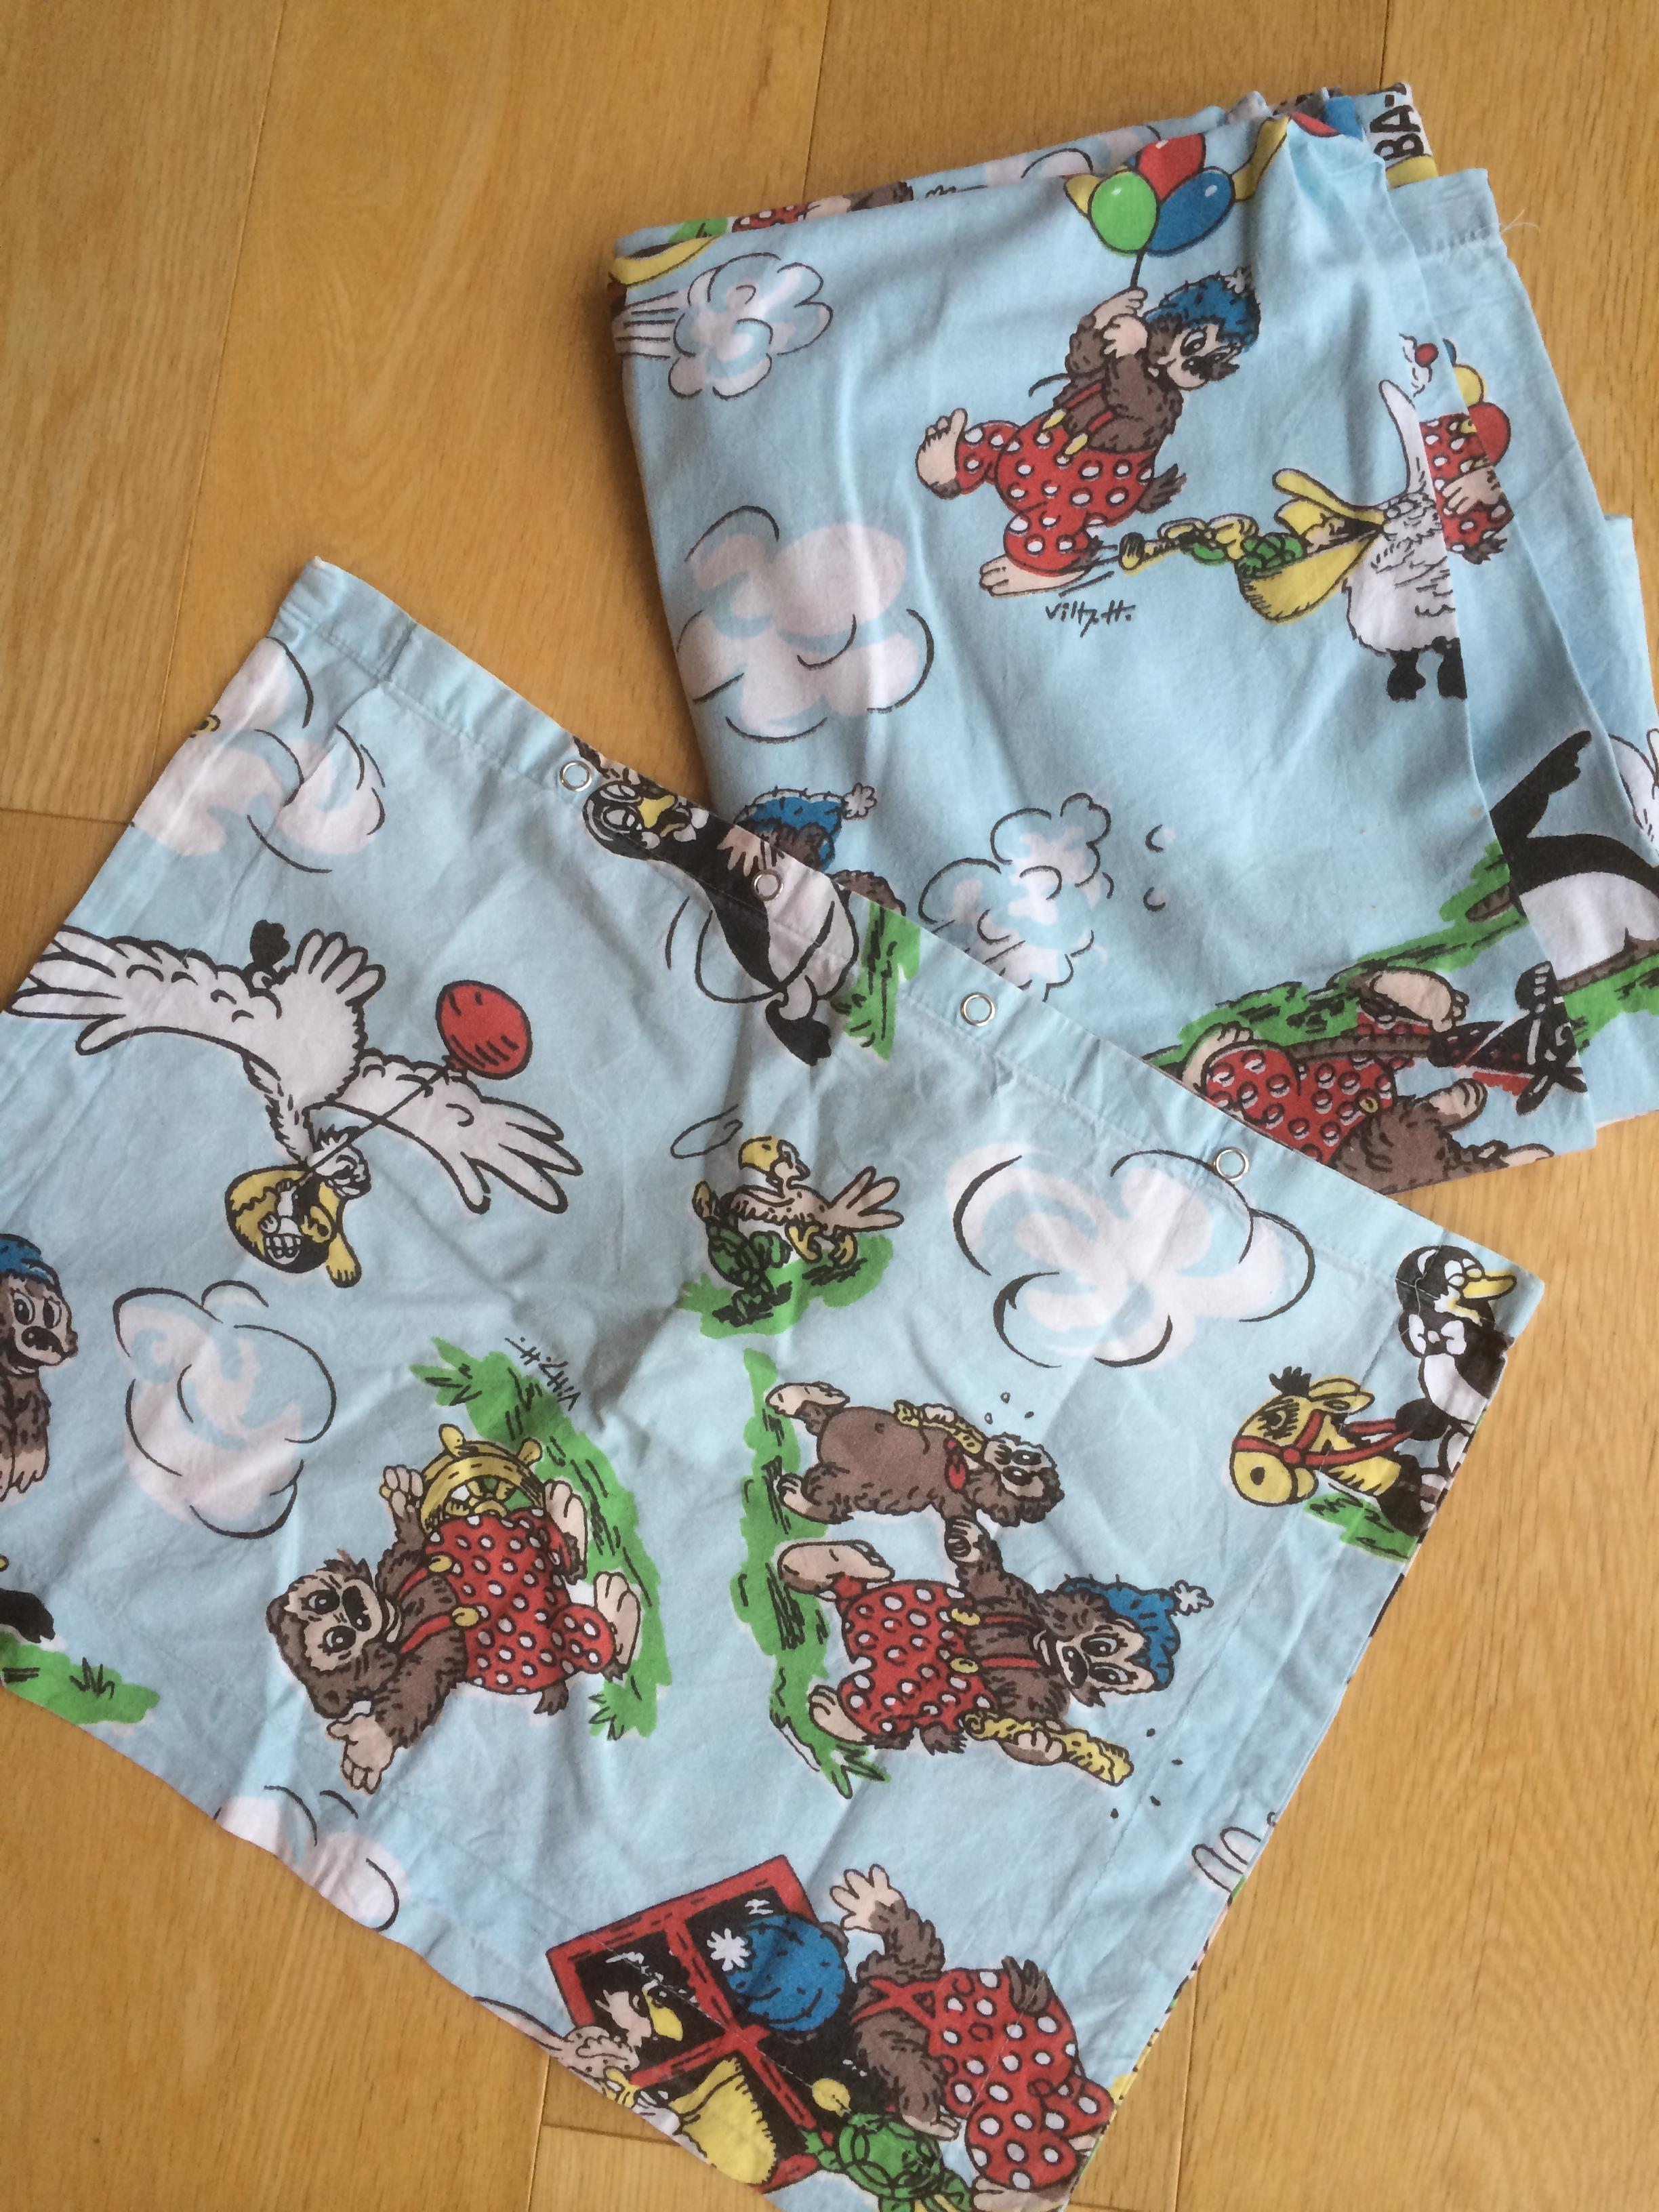 rasmus klump sengetøj Rasmus Klump kjole af sengetøj og med hæklede pandekager – mit  rasmus klump sengetøj